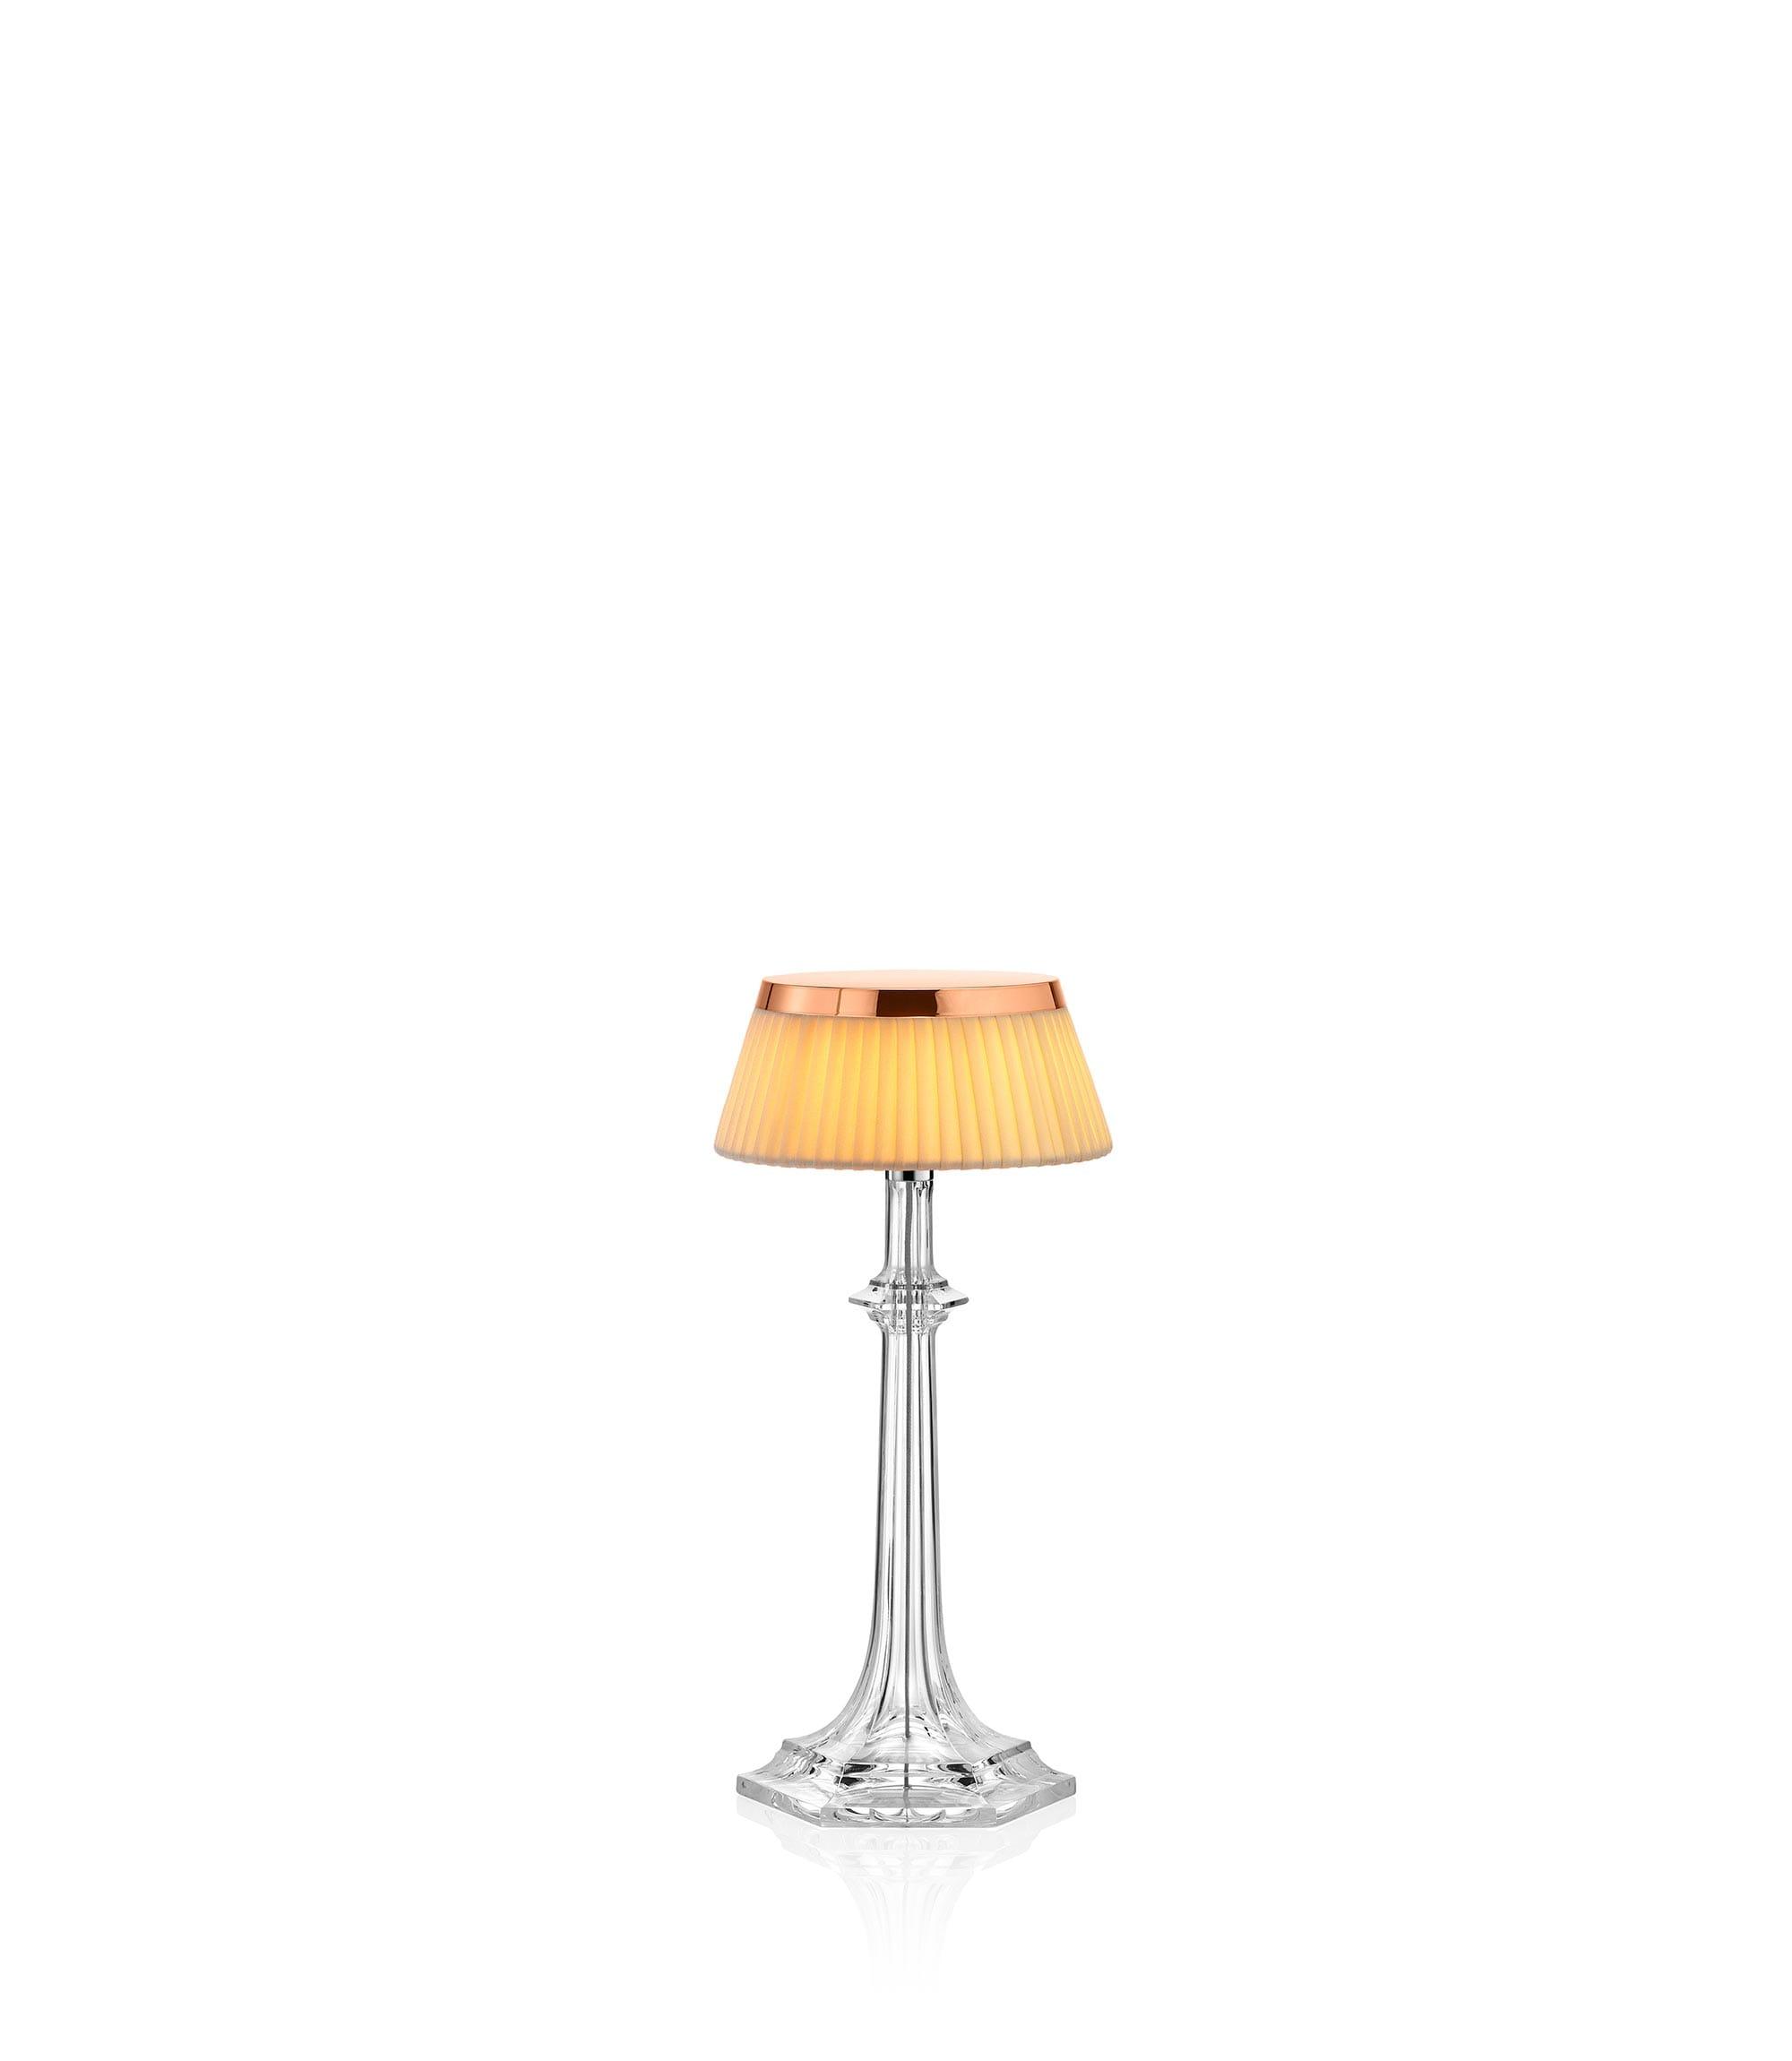 Bon jour versailles small table starck flos F1042015 product still life big 1